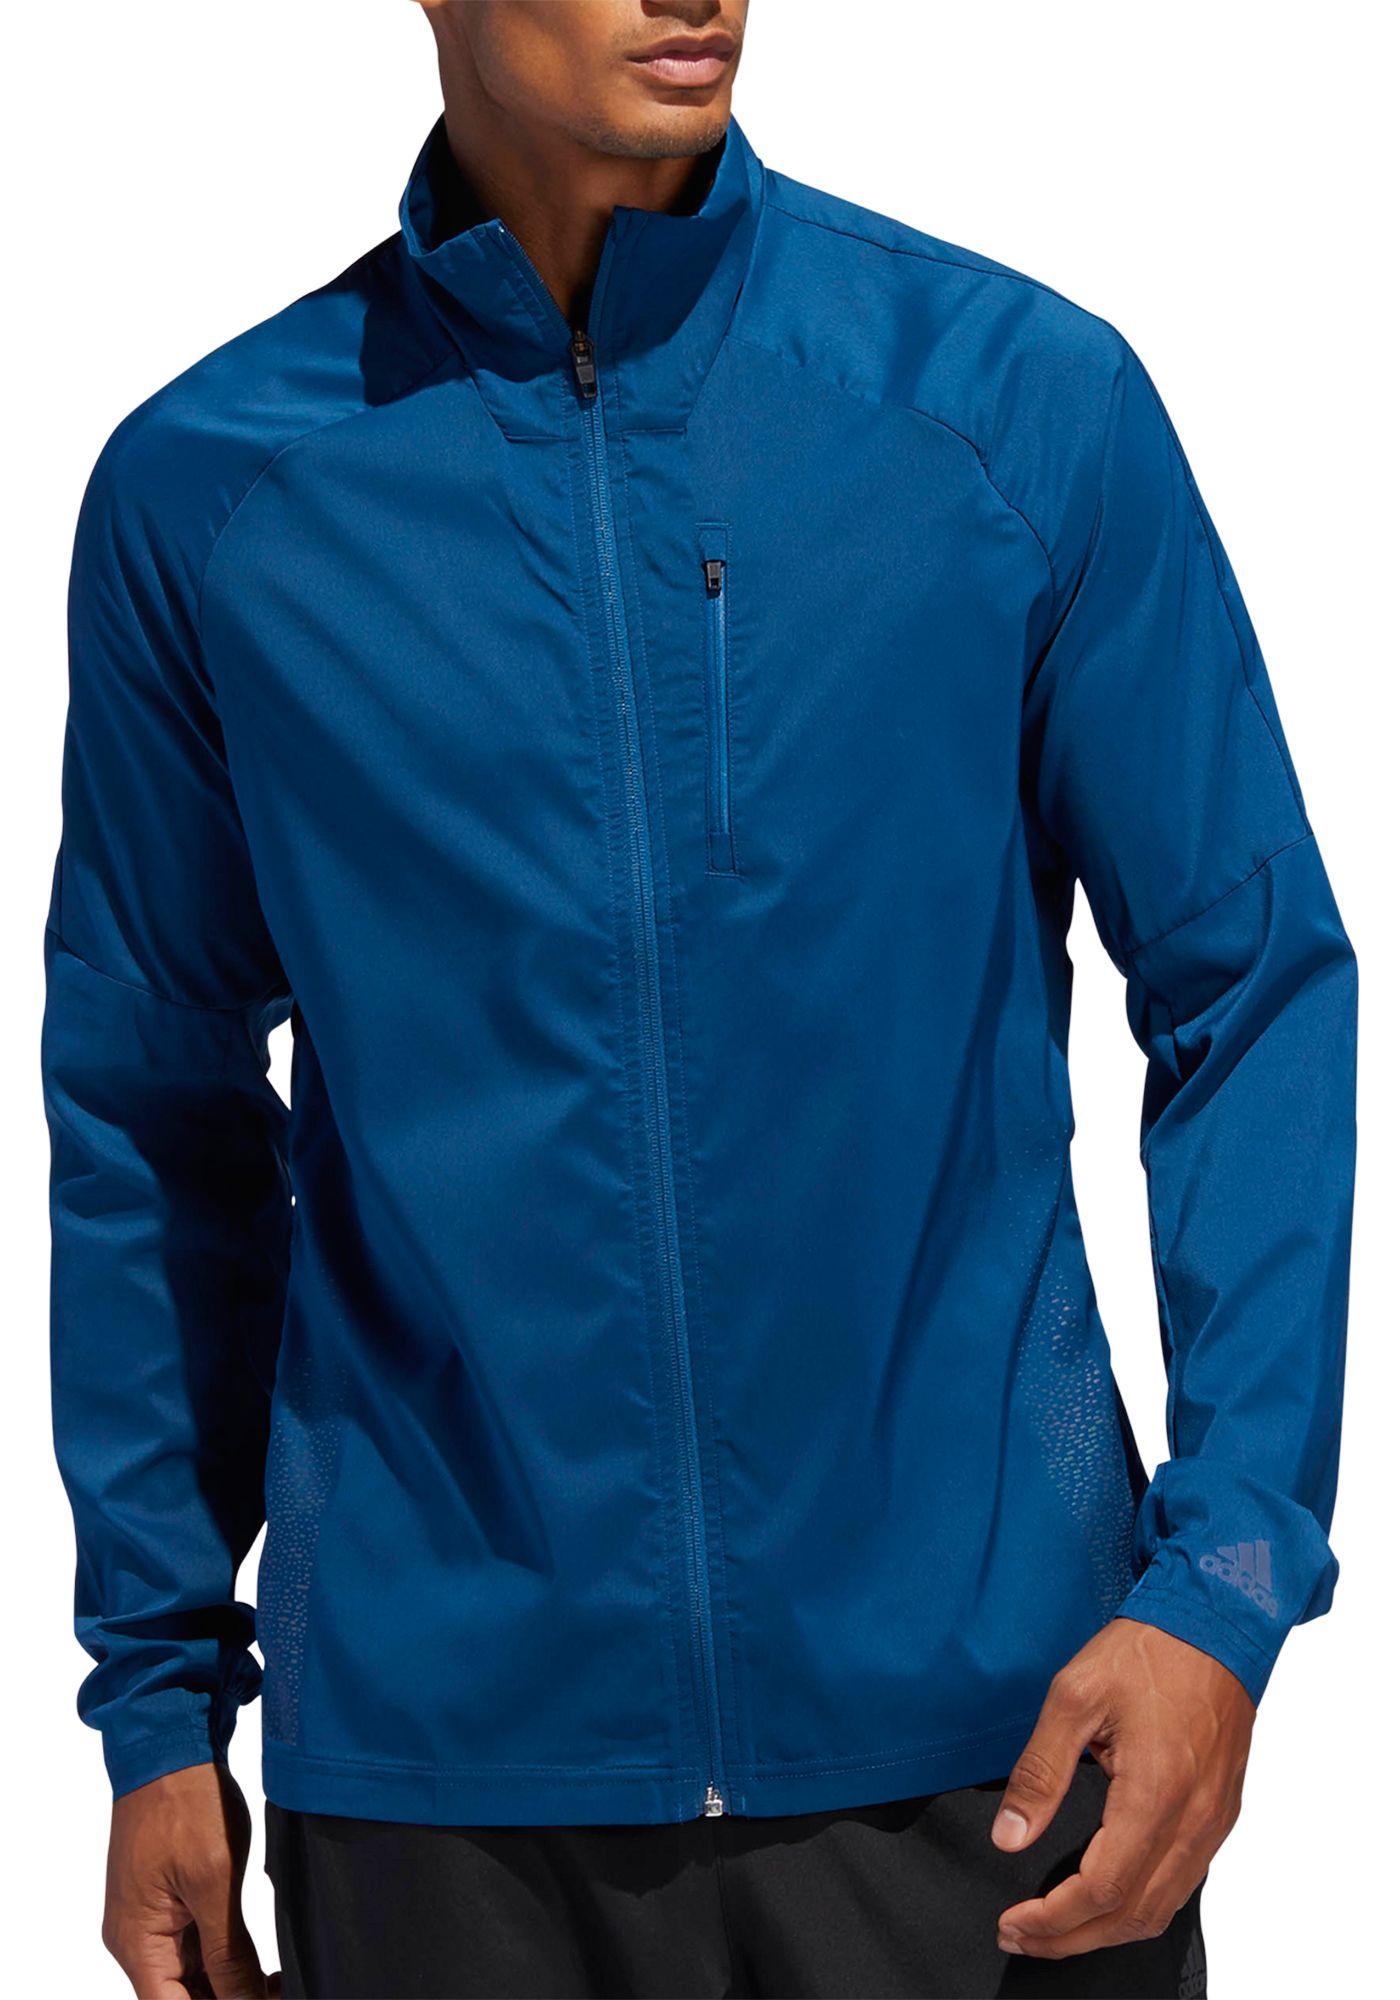 adidas Men's Supernova Confident Three Season Jacket